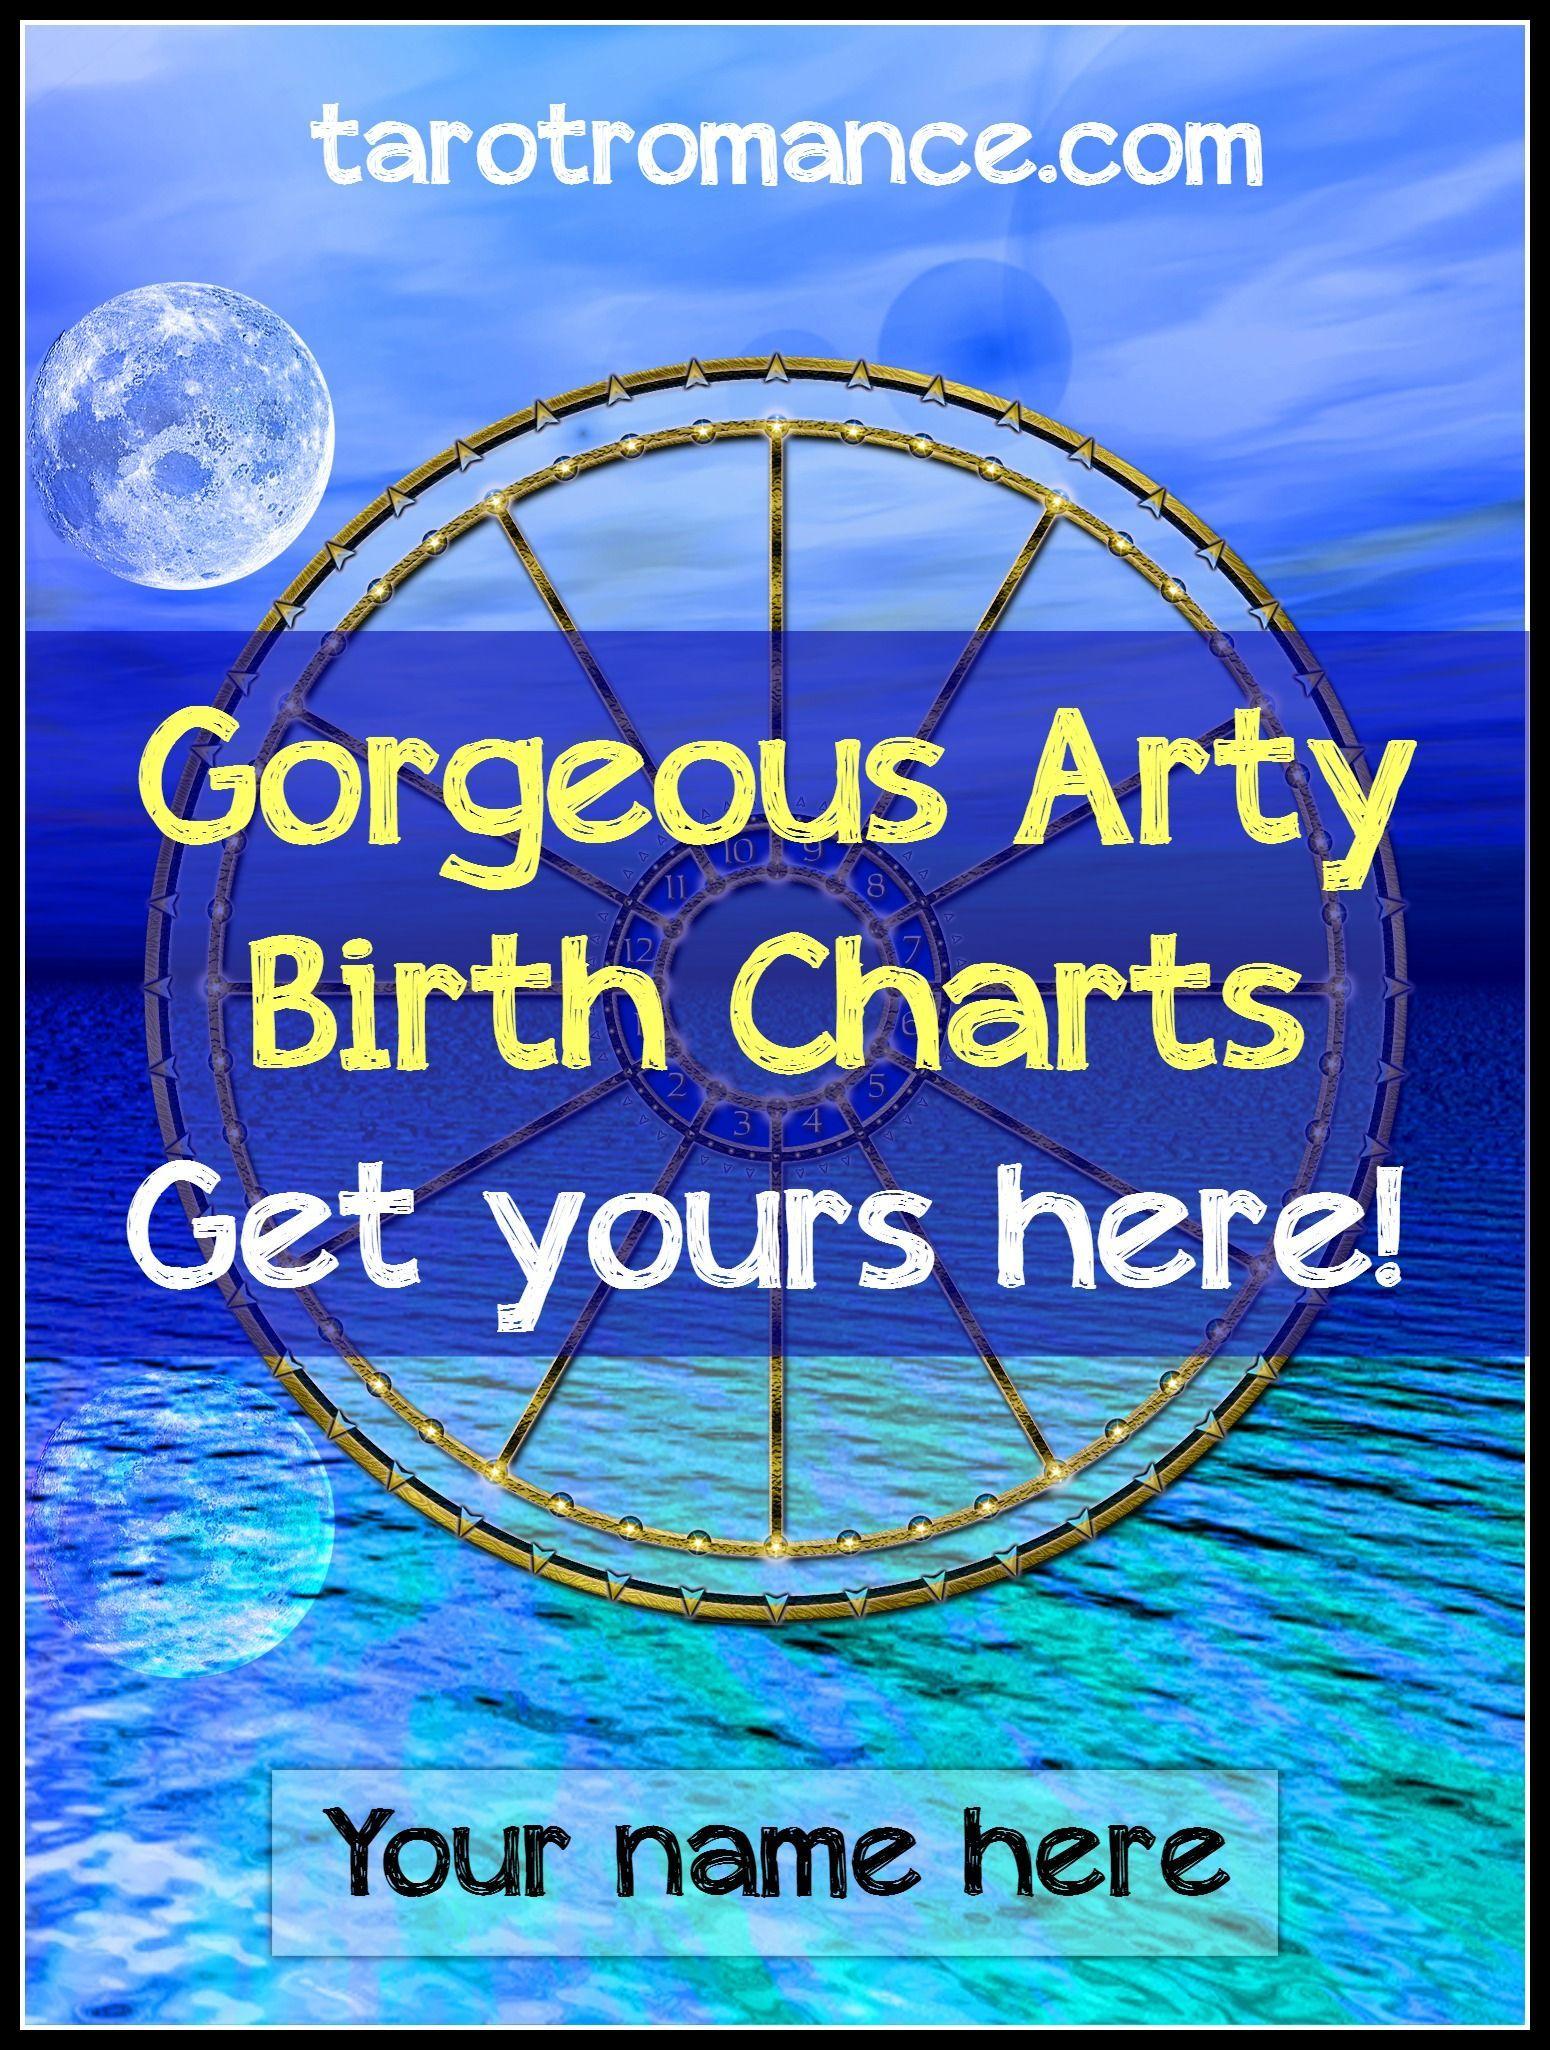 Birth chart vedic astrology free choice image free any chart baby birth chart astrology images free any chart examples tamil astrology birth chart choice image free nvjuhfo Image collections